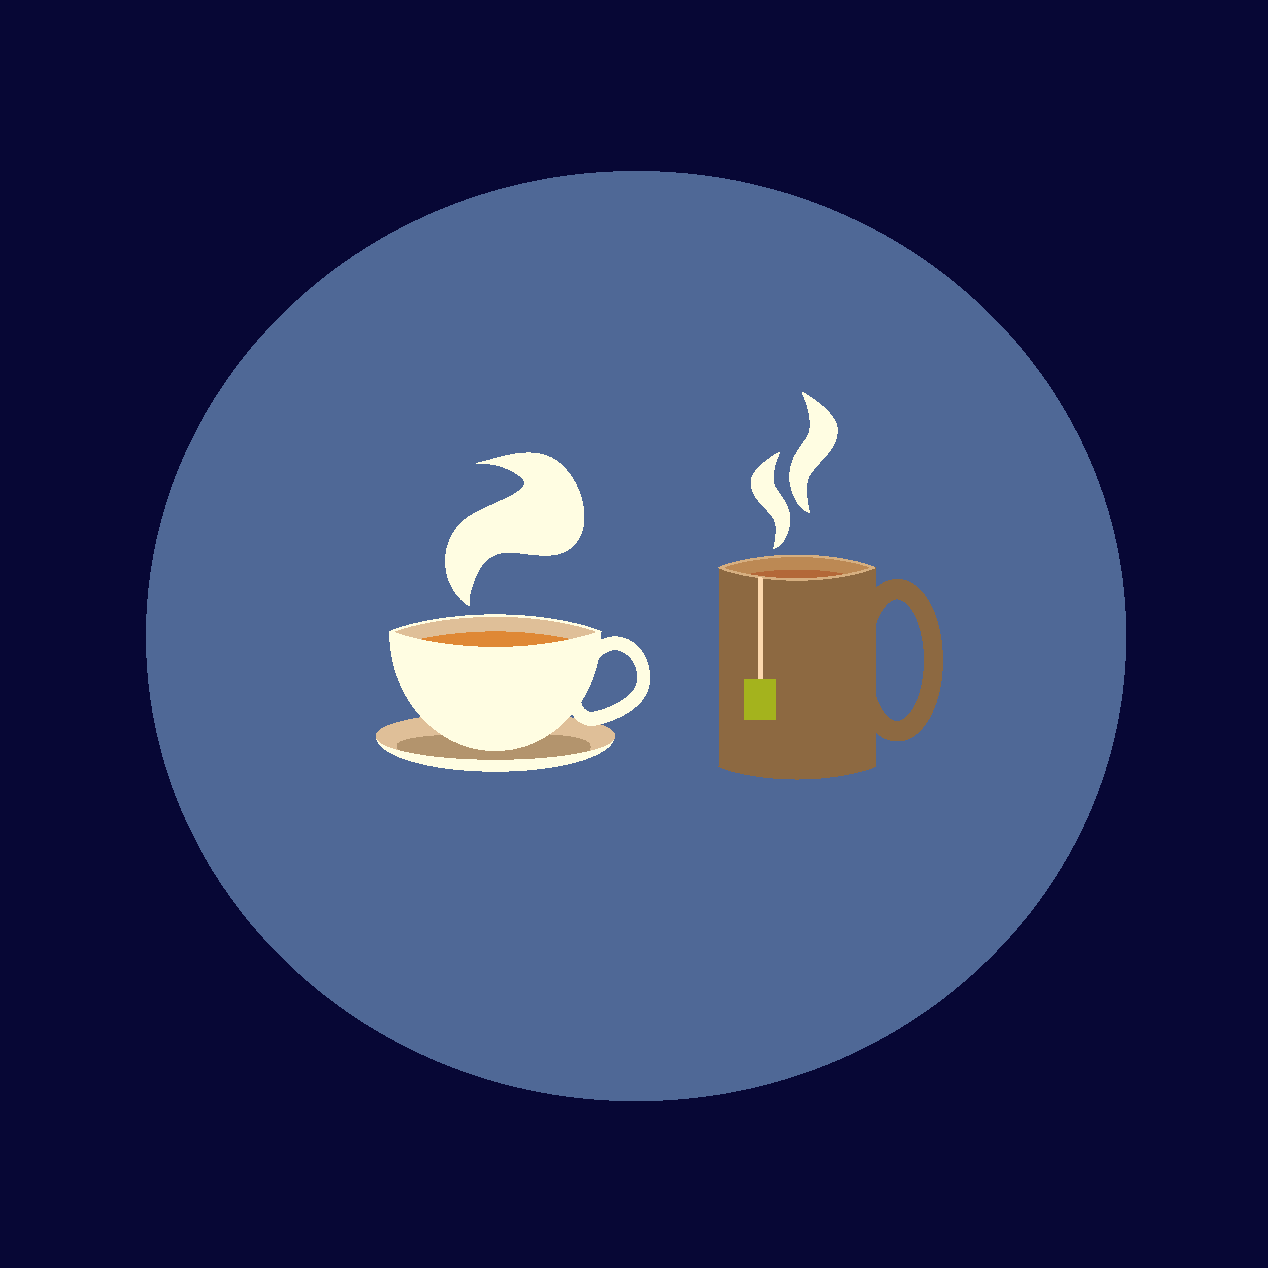 Caffeine In Tea vs Coffee